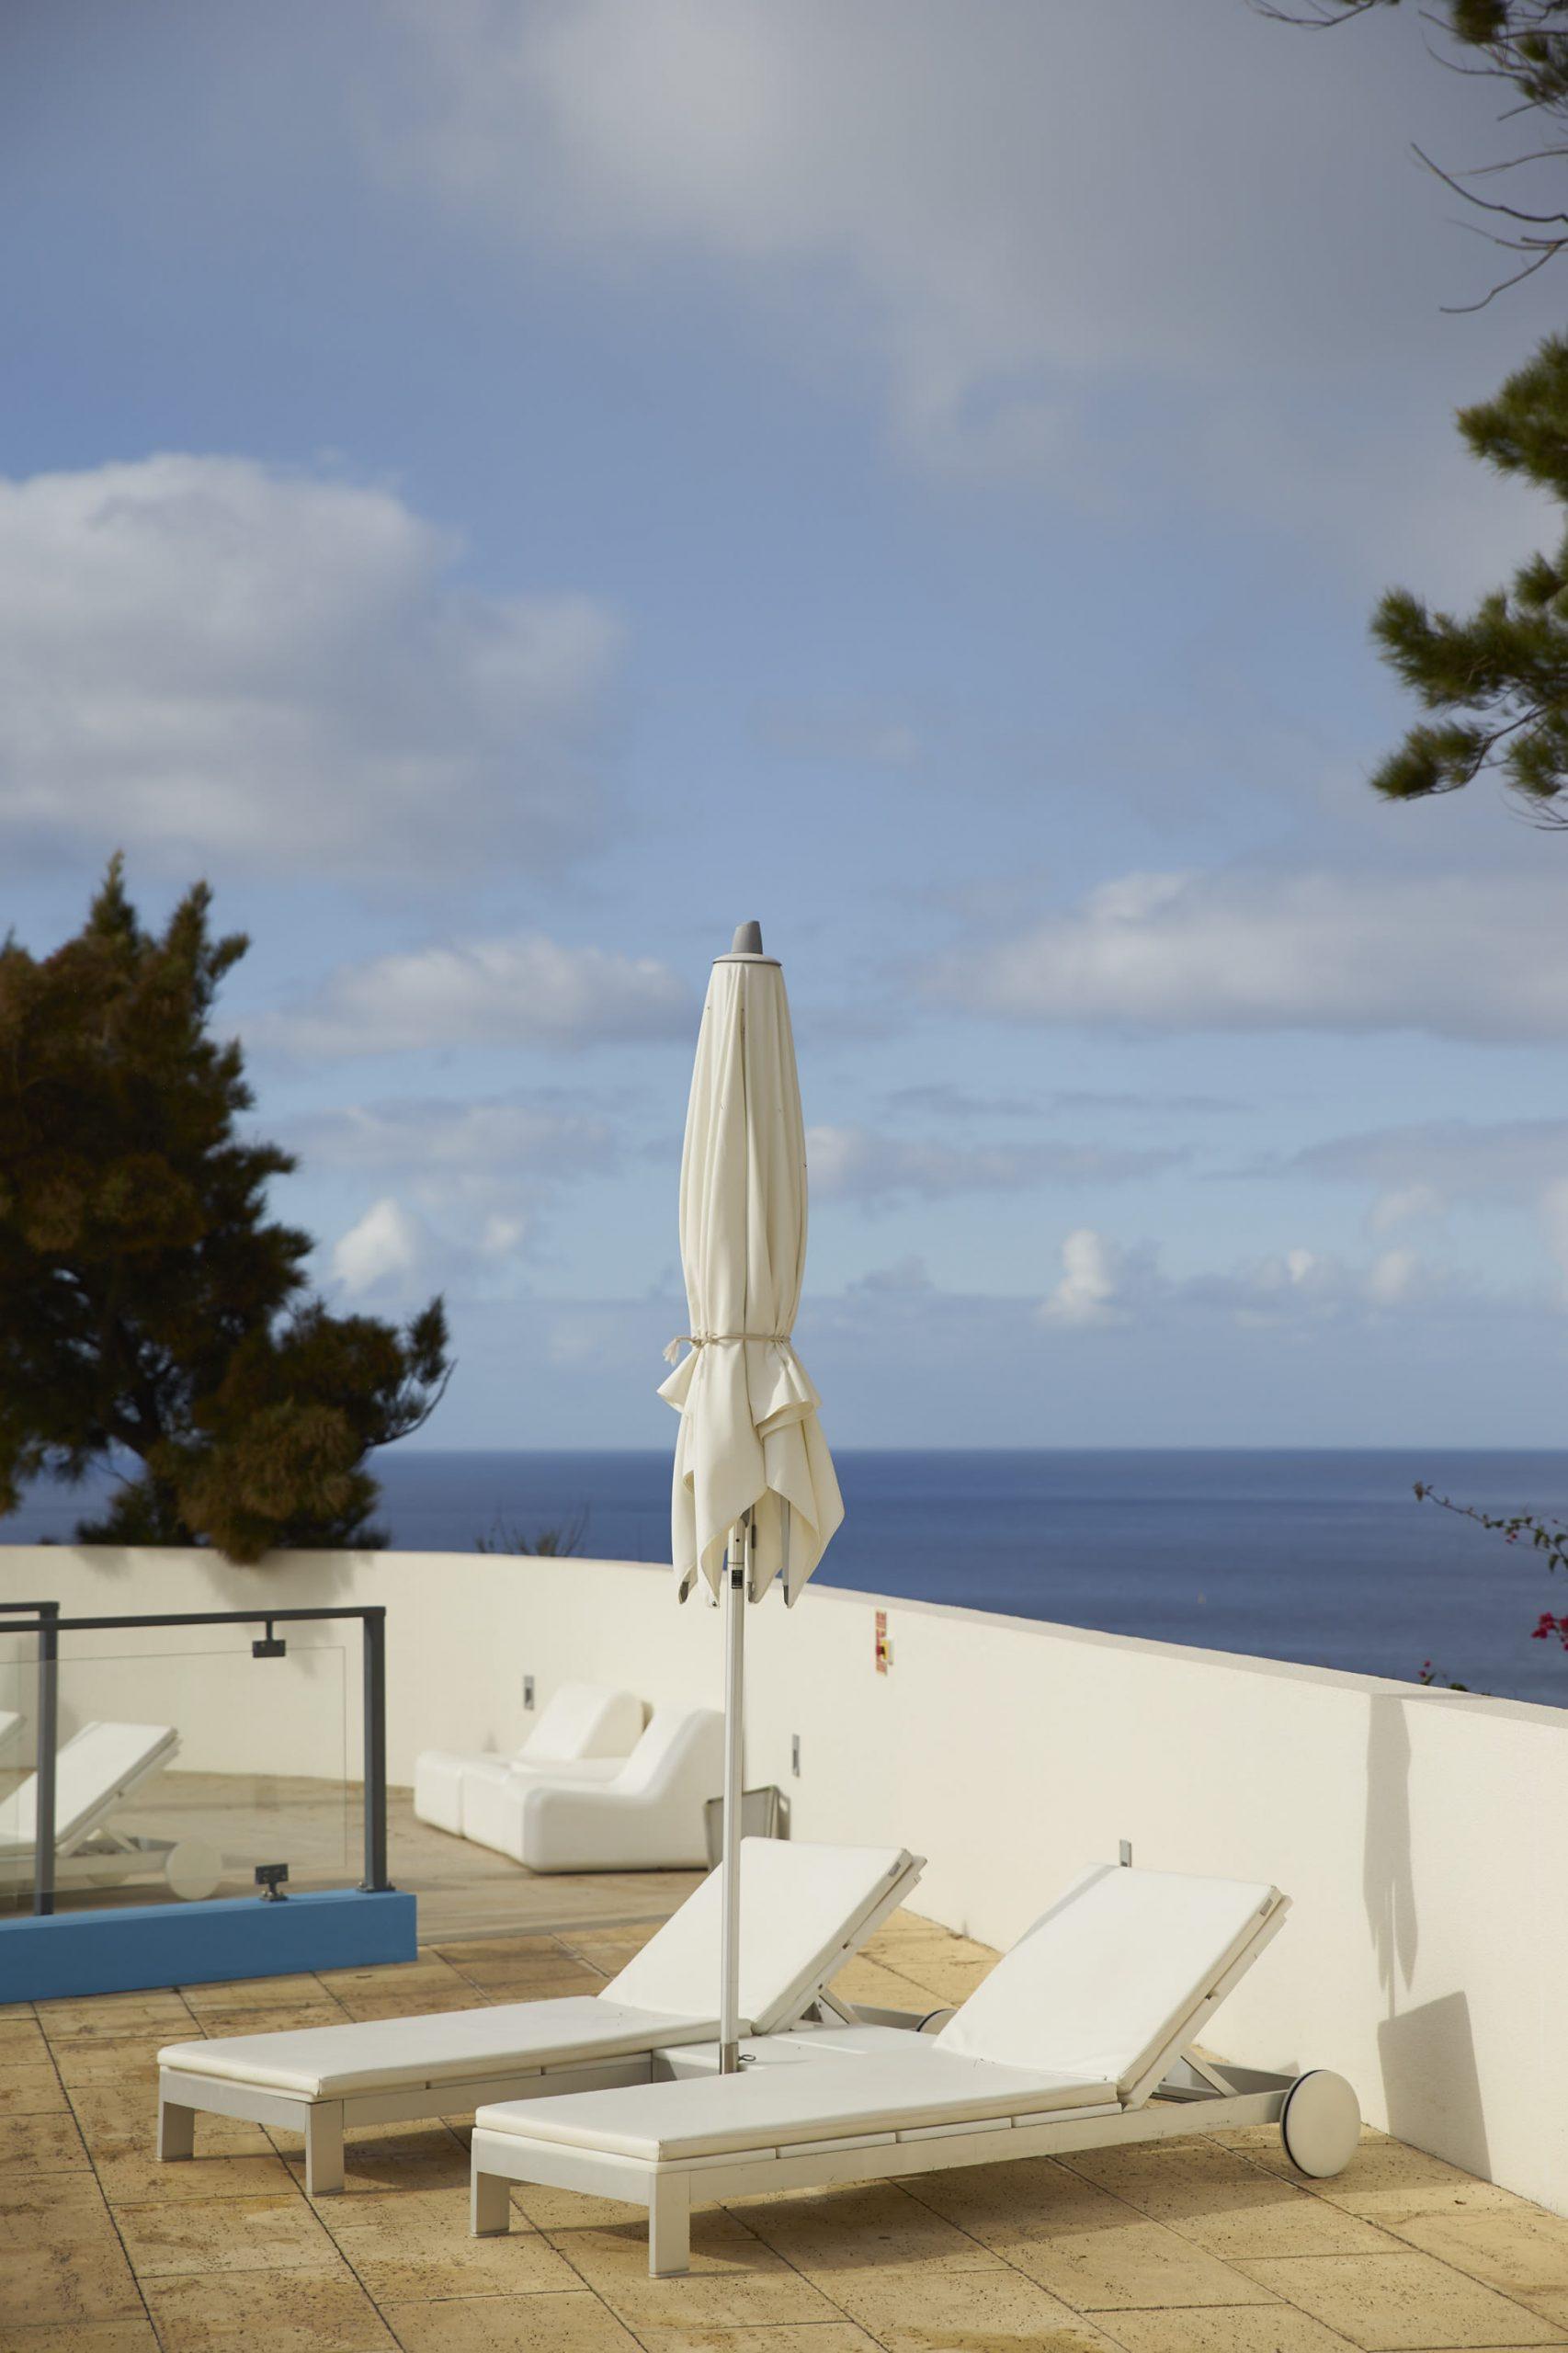 Moodfotografie Madeira 2020